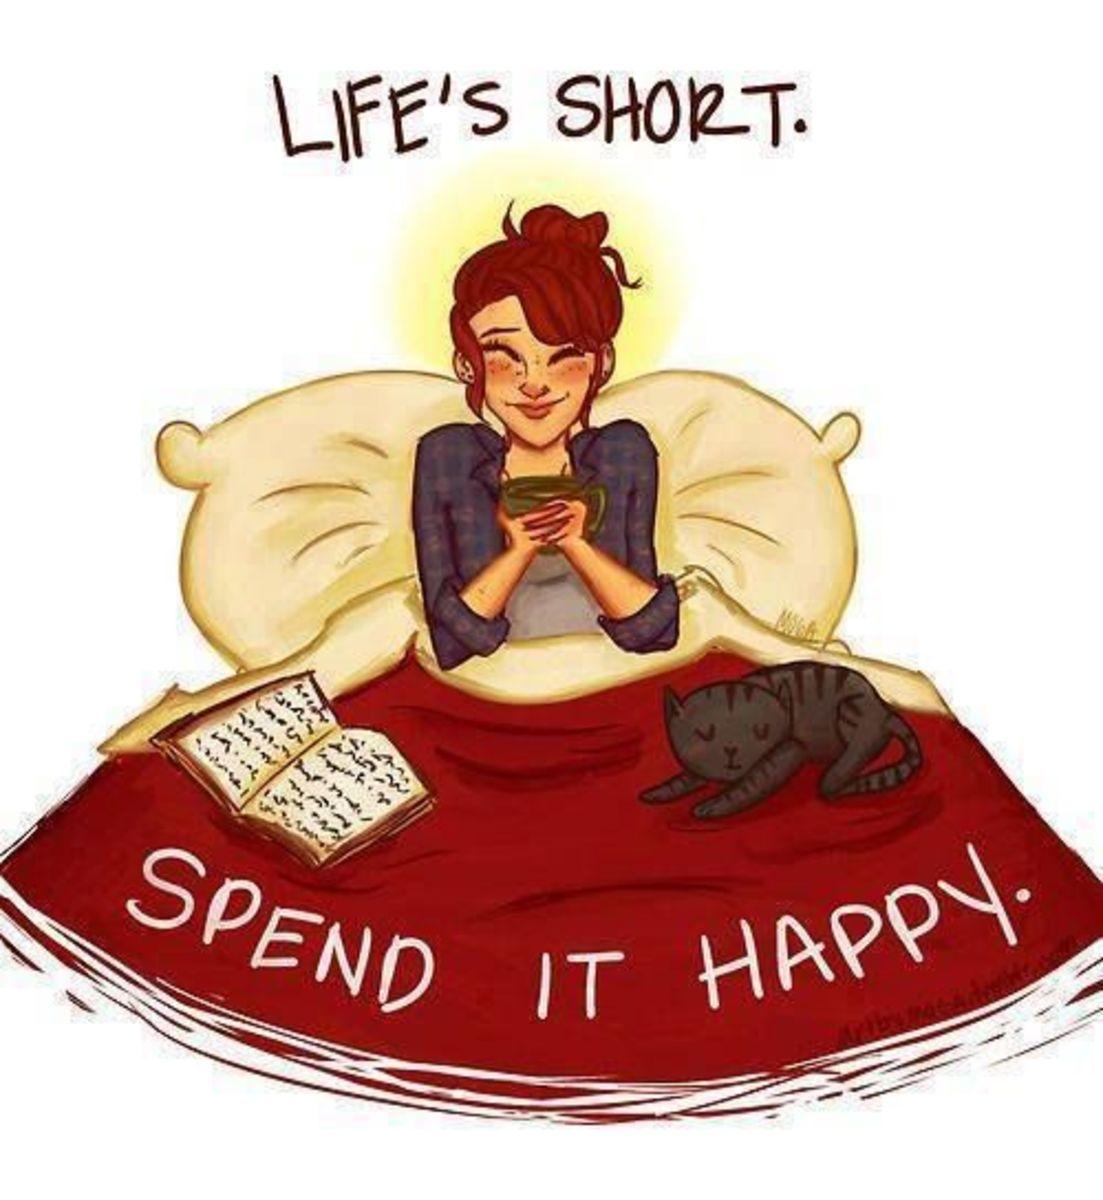 Life's Short. Spend it Happy